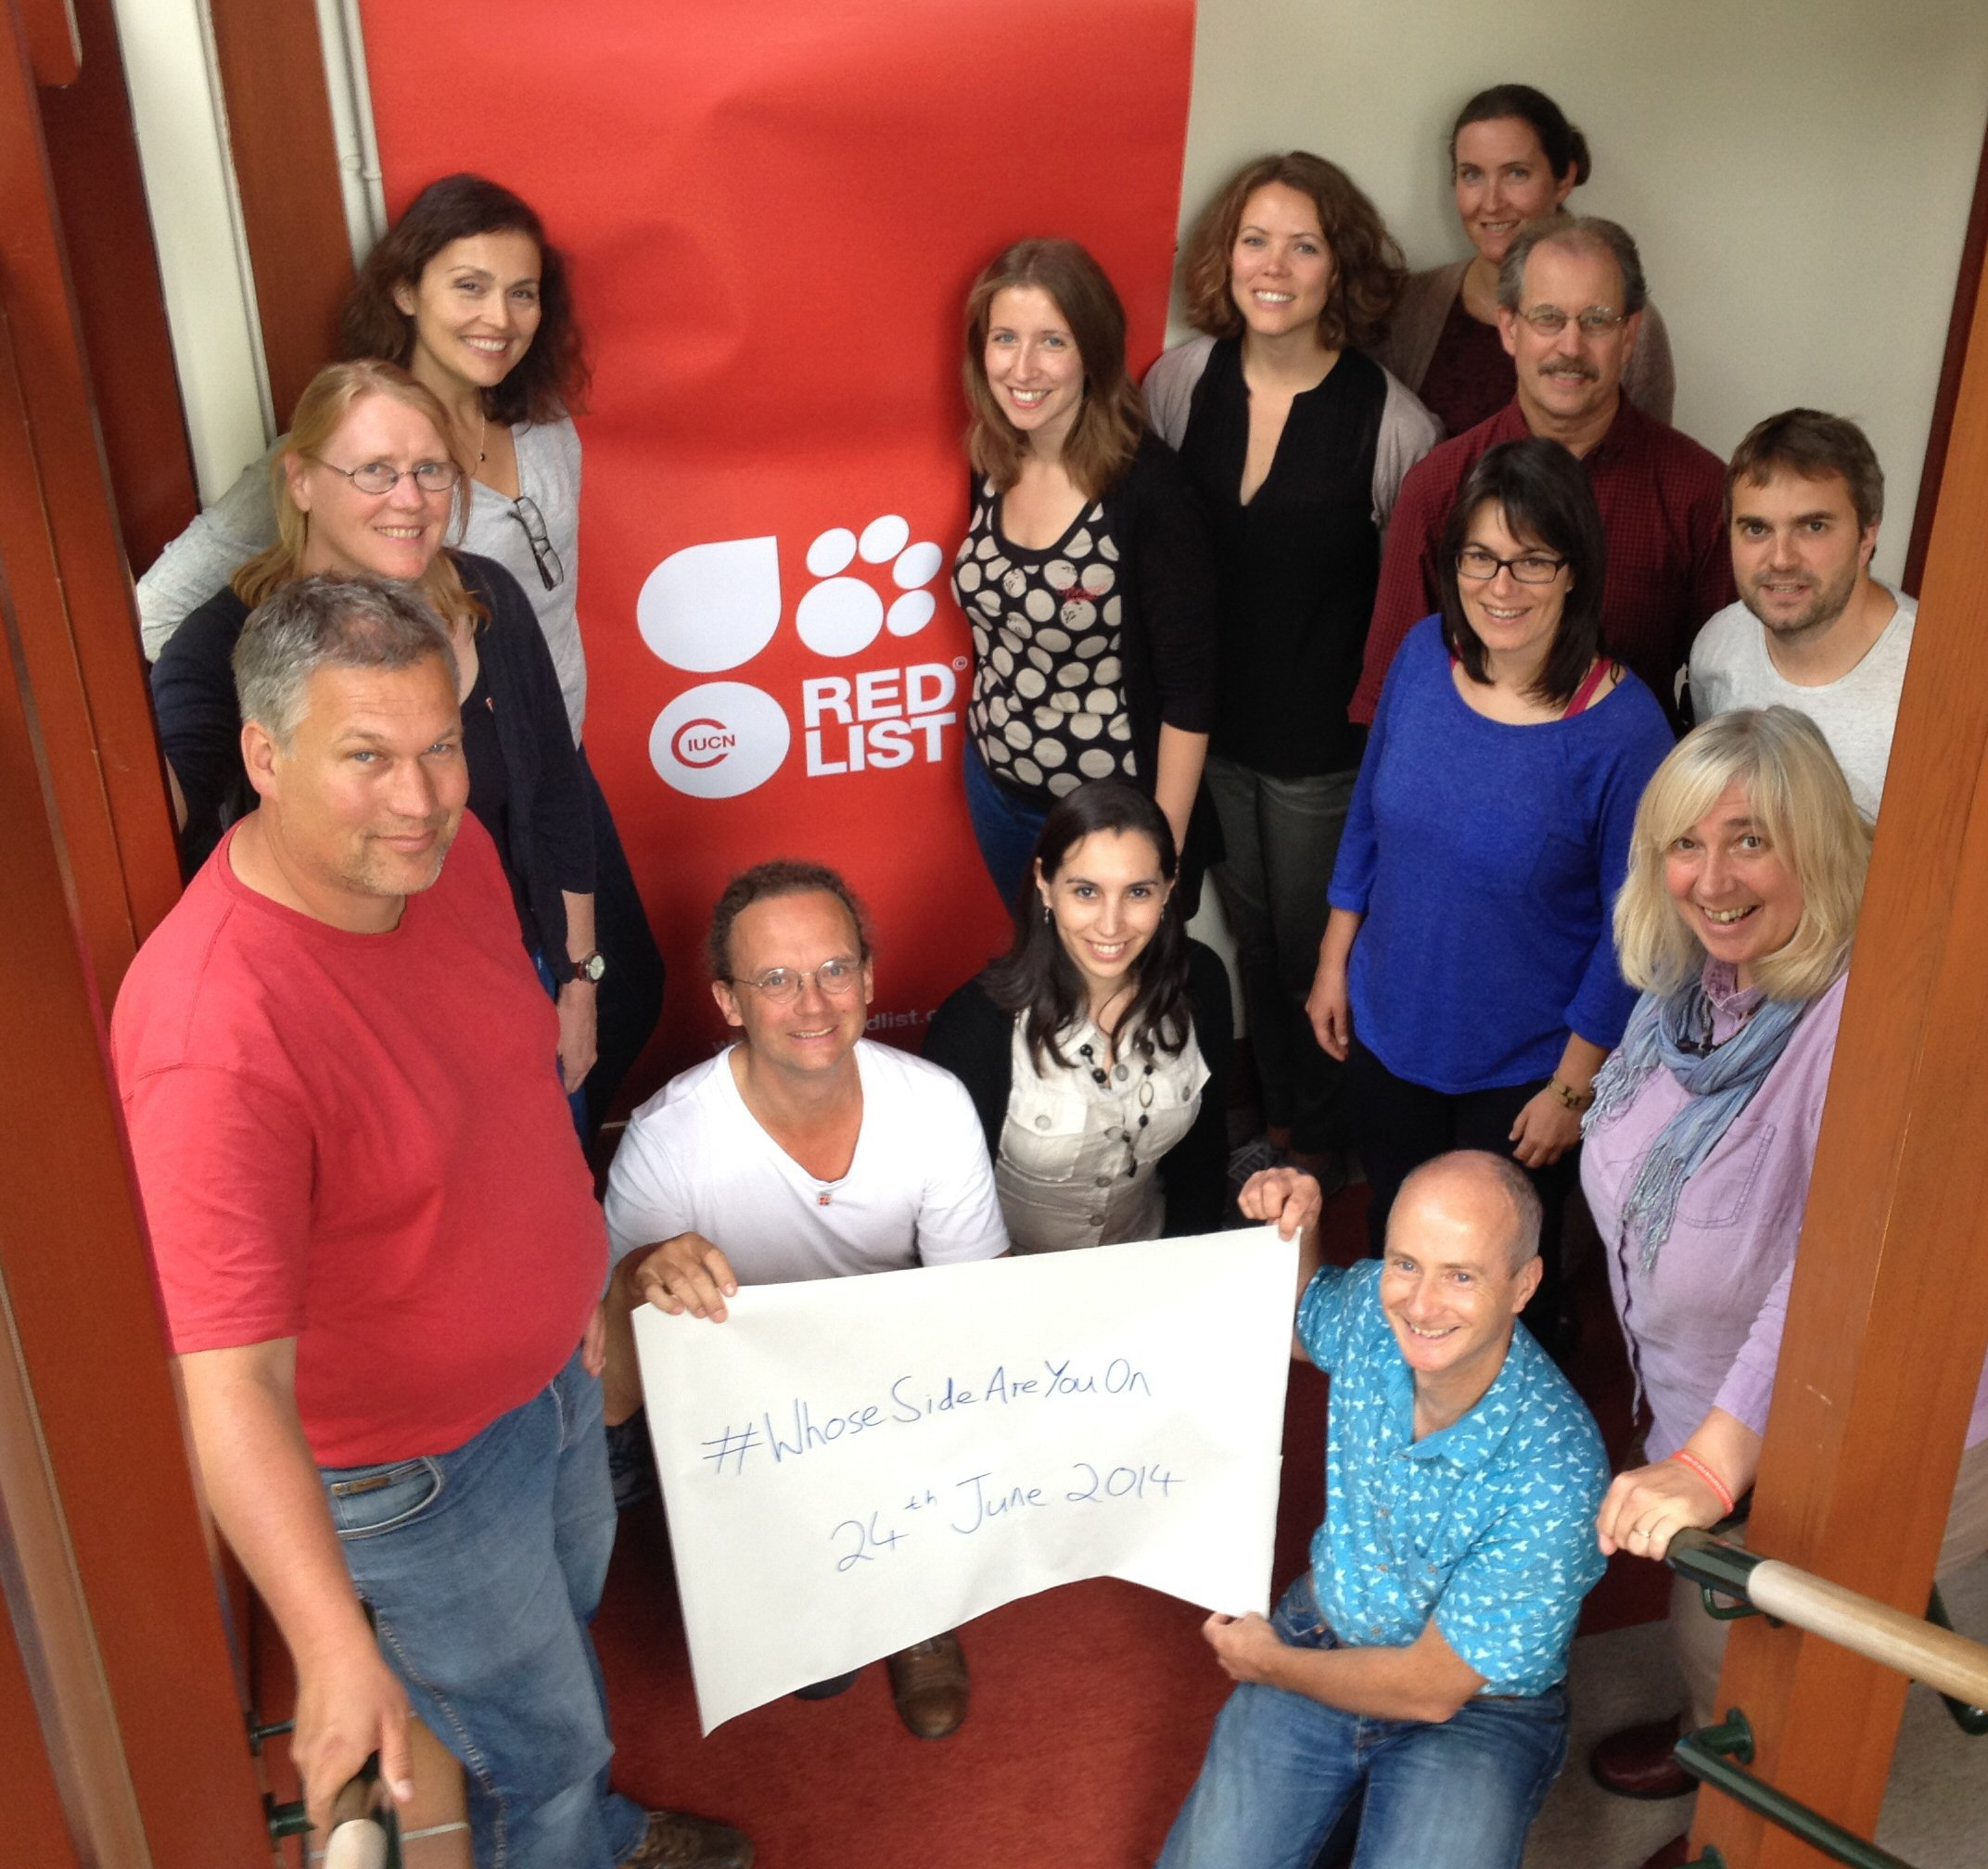 Participants of IUCN Red List Trainers' Workshop, Cambridge, UK (June 2014)